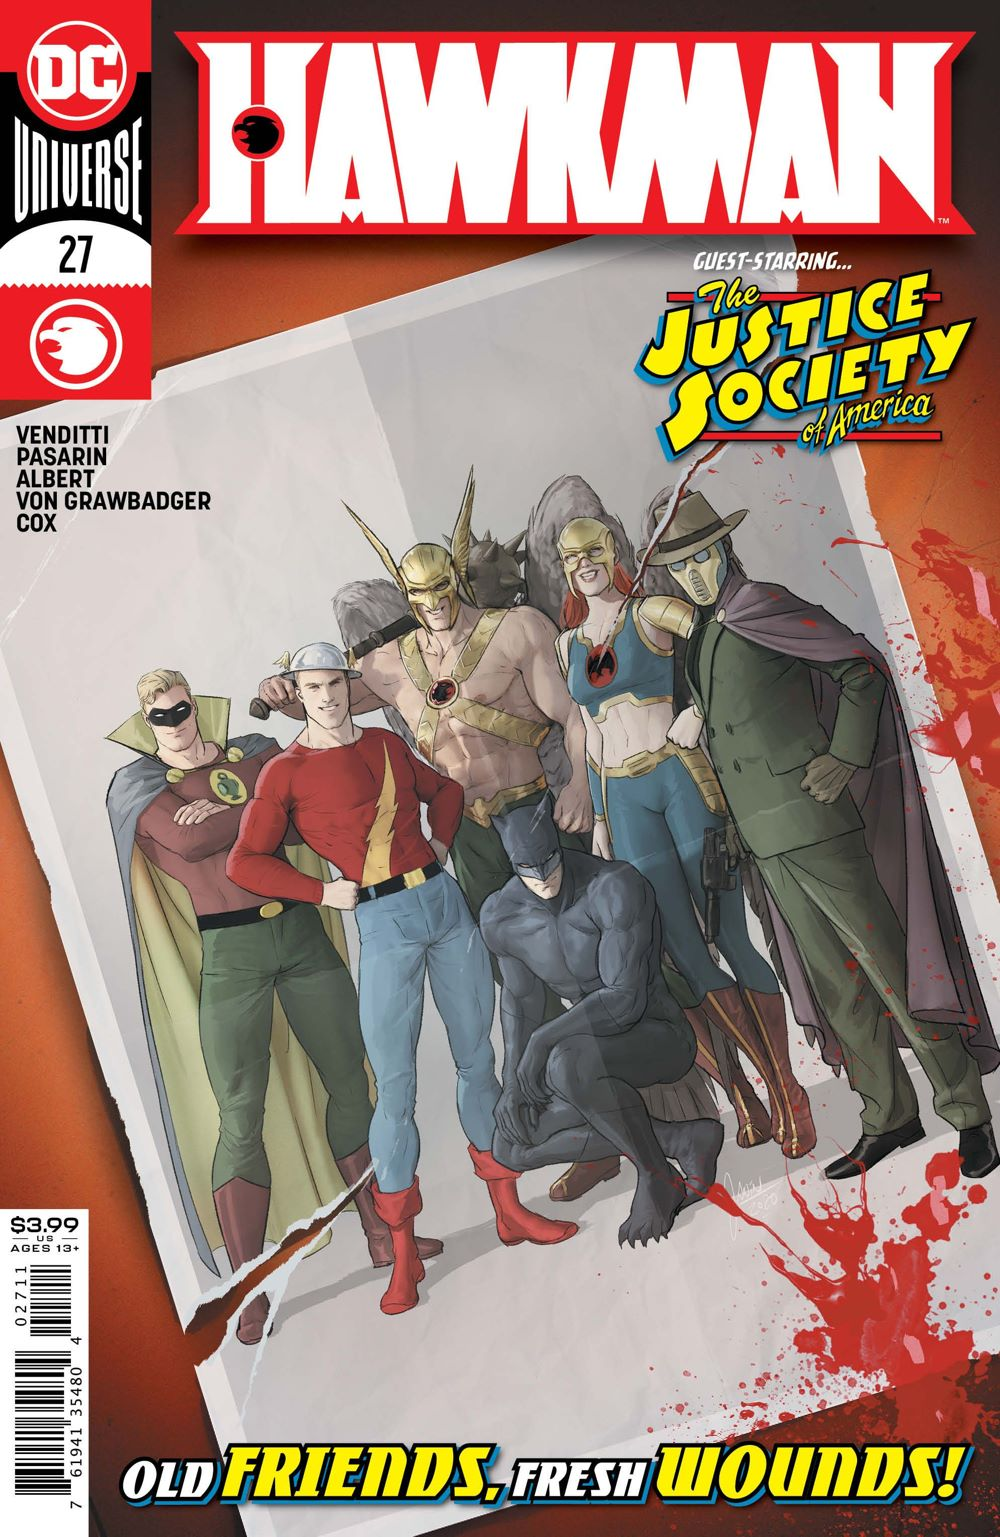 HWKM-Cv27 ComicList Previews: HAWKMAN #27